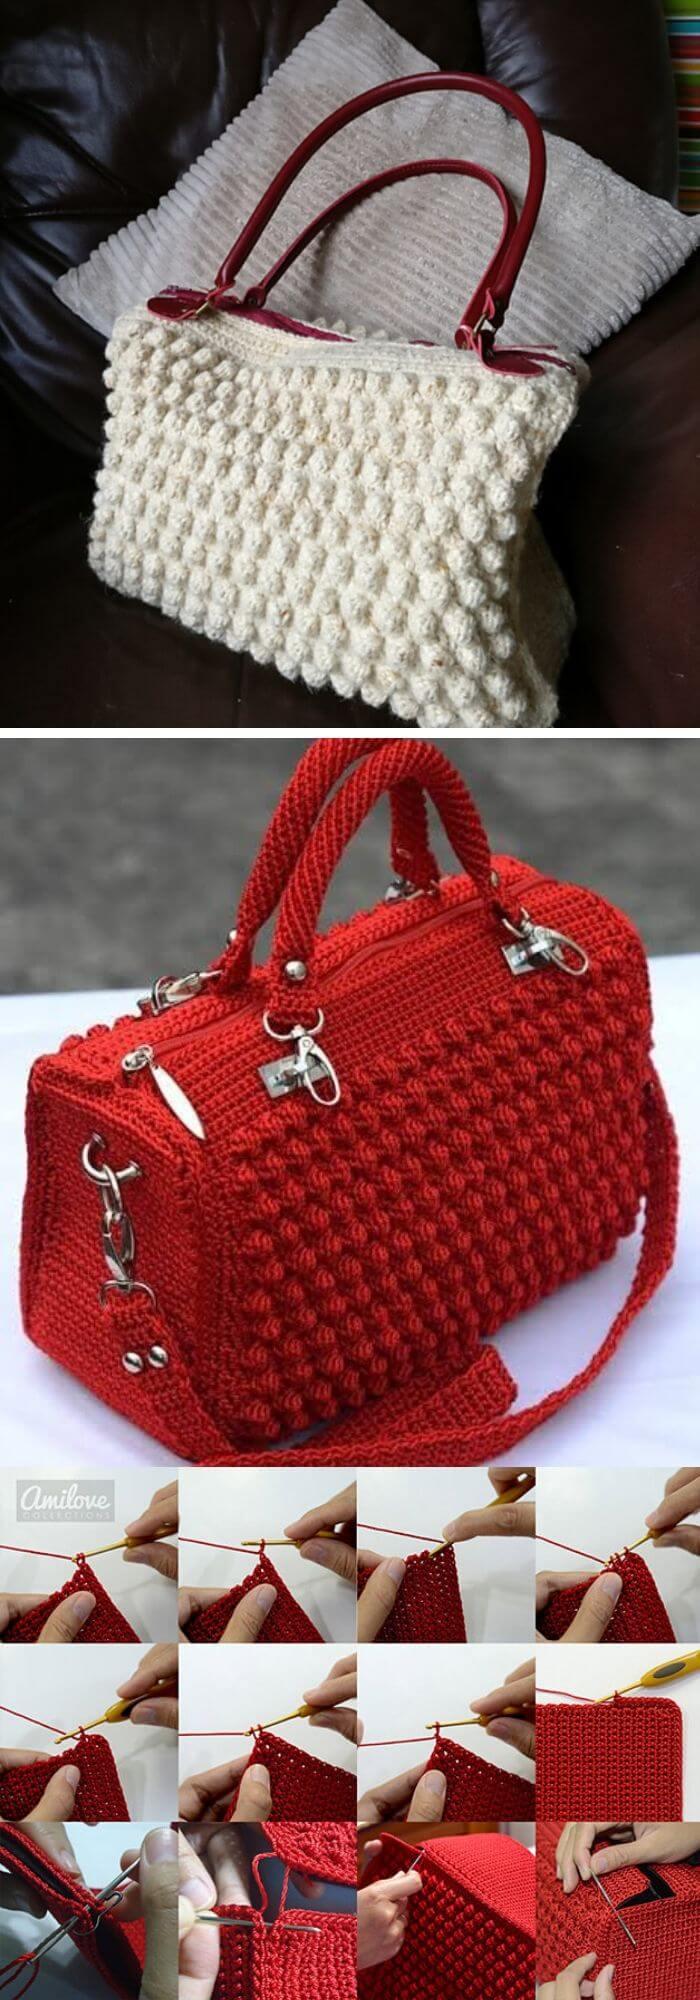 The bobble stitch handbag